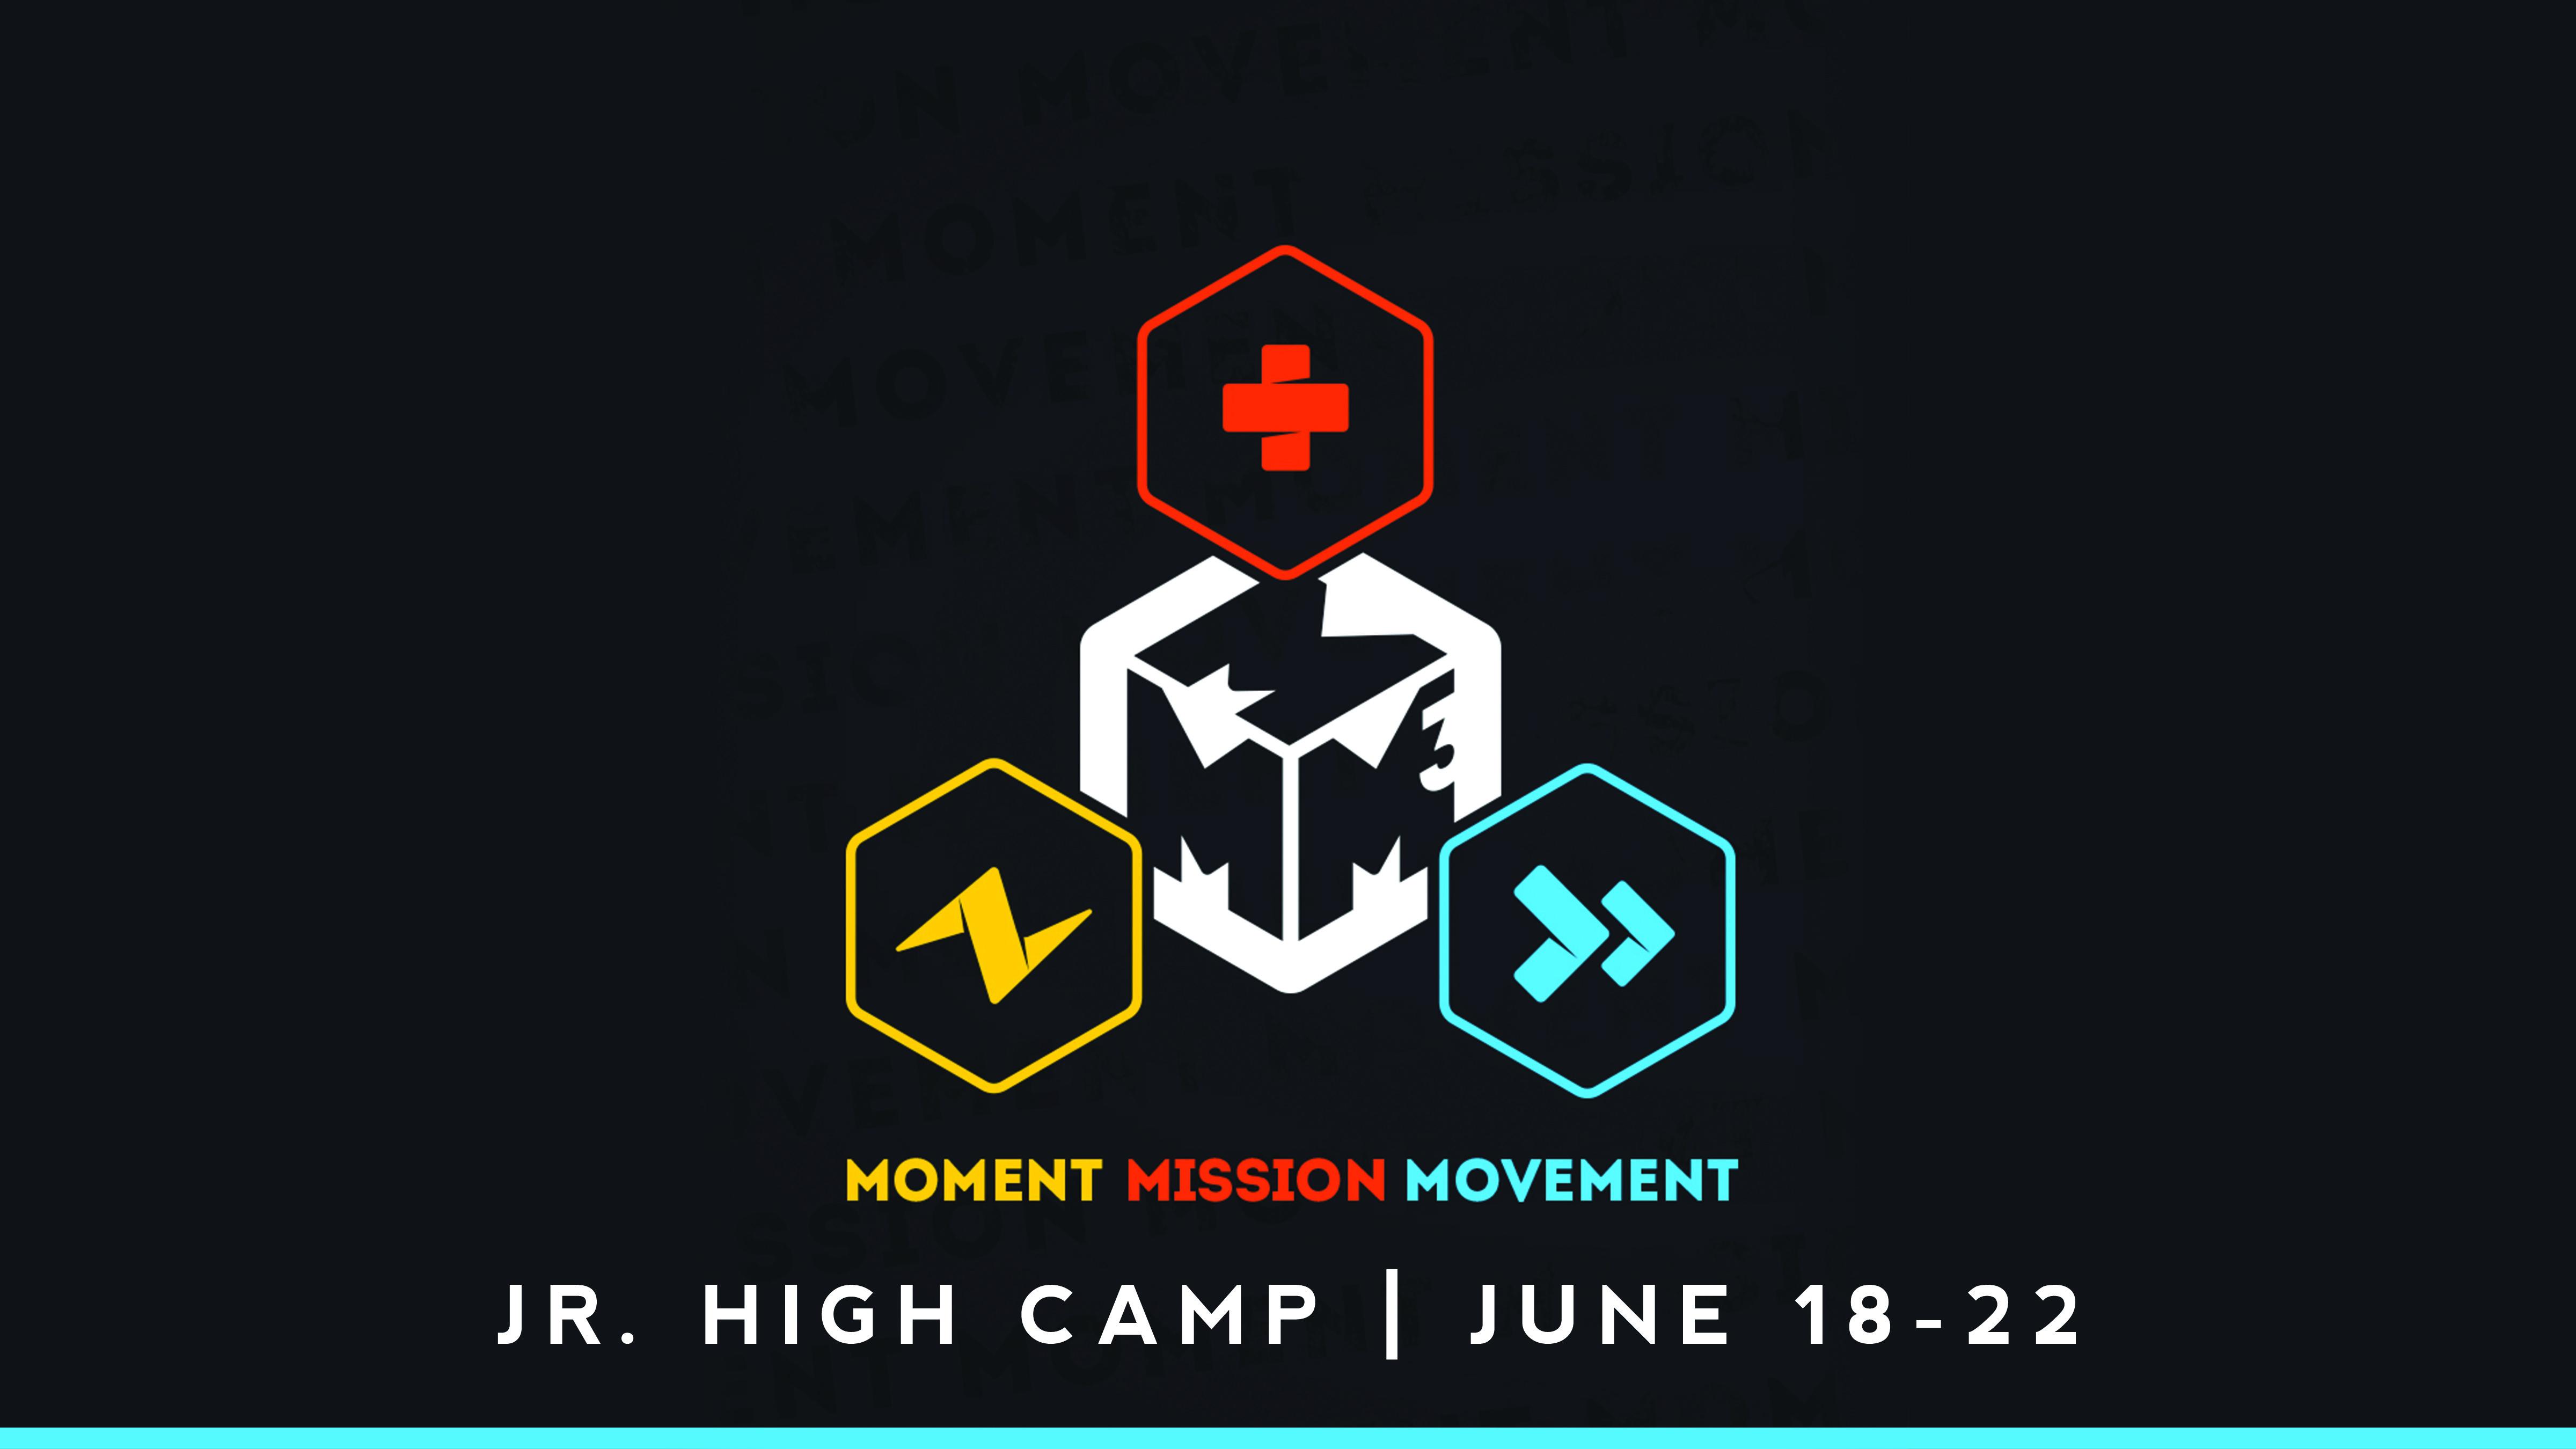 Jr. high camp  m3  18 16x9